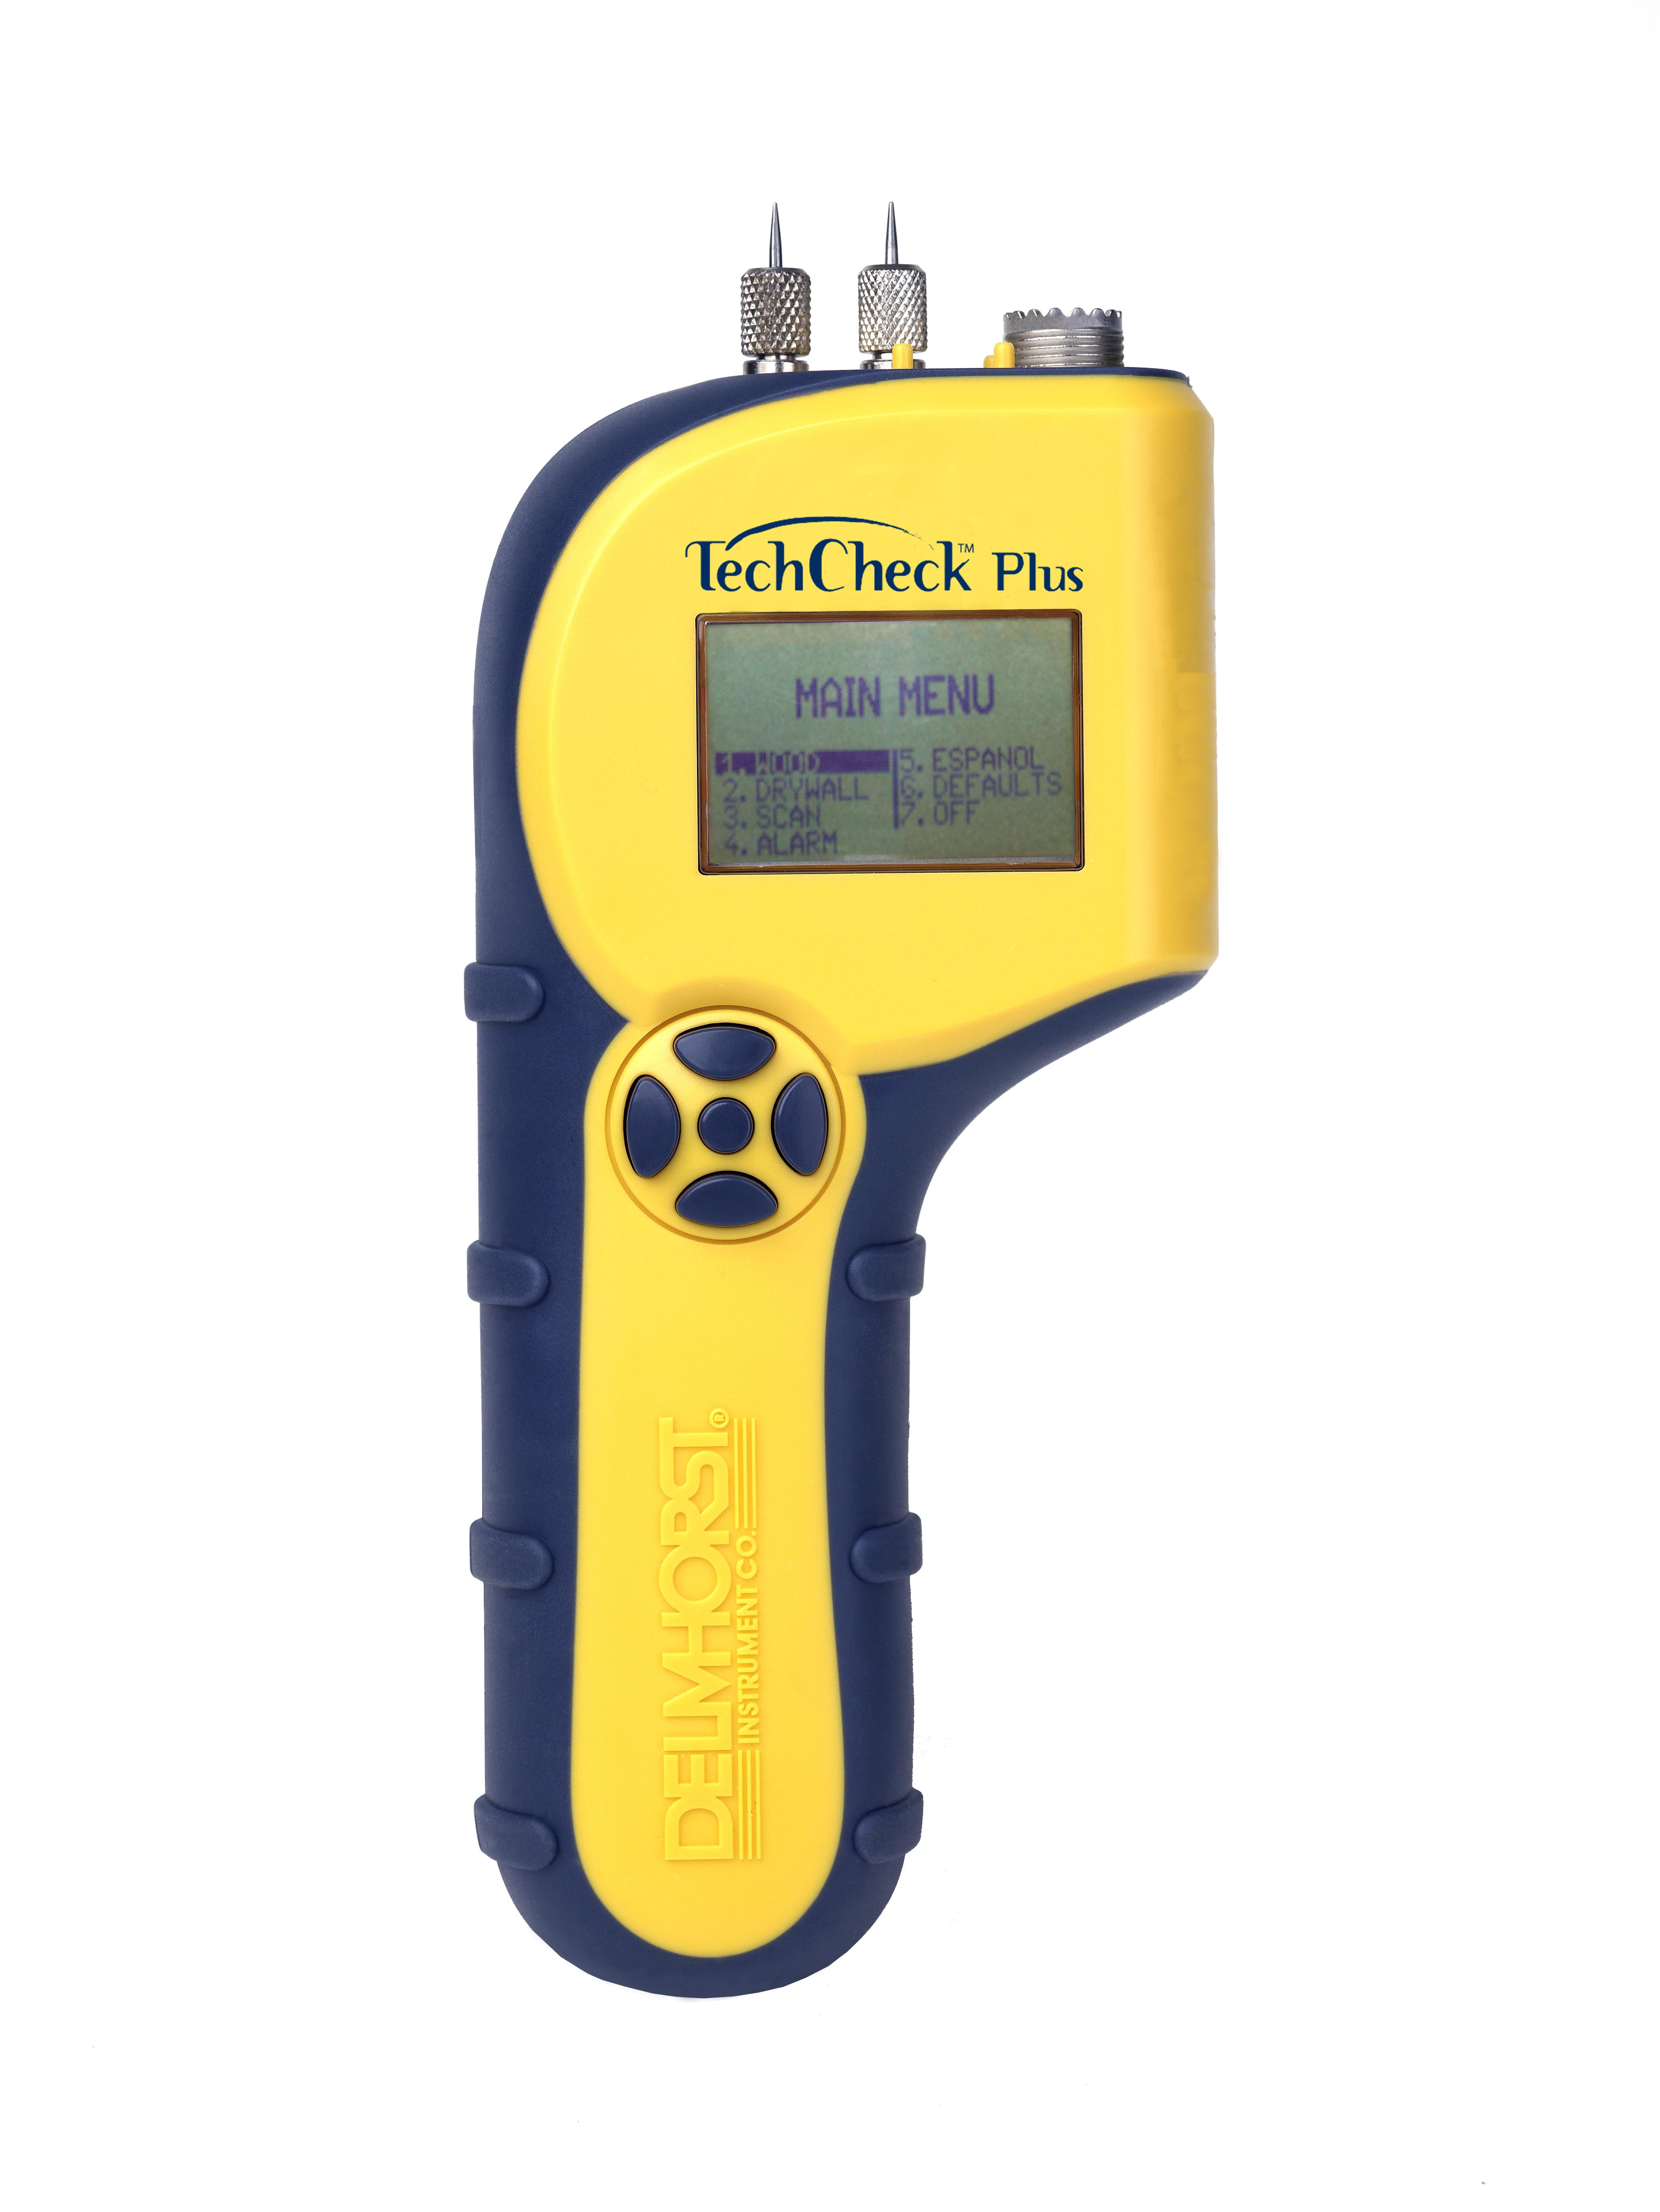 TechCheck Plus moisture meter.